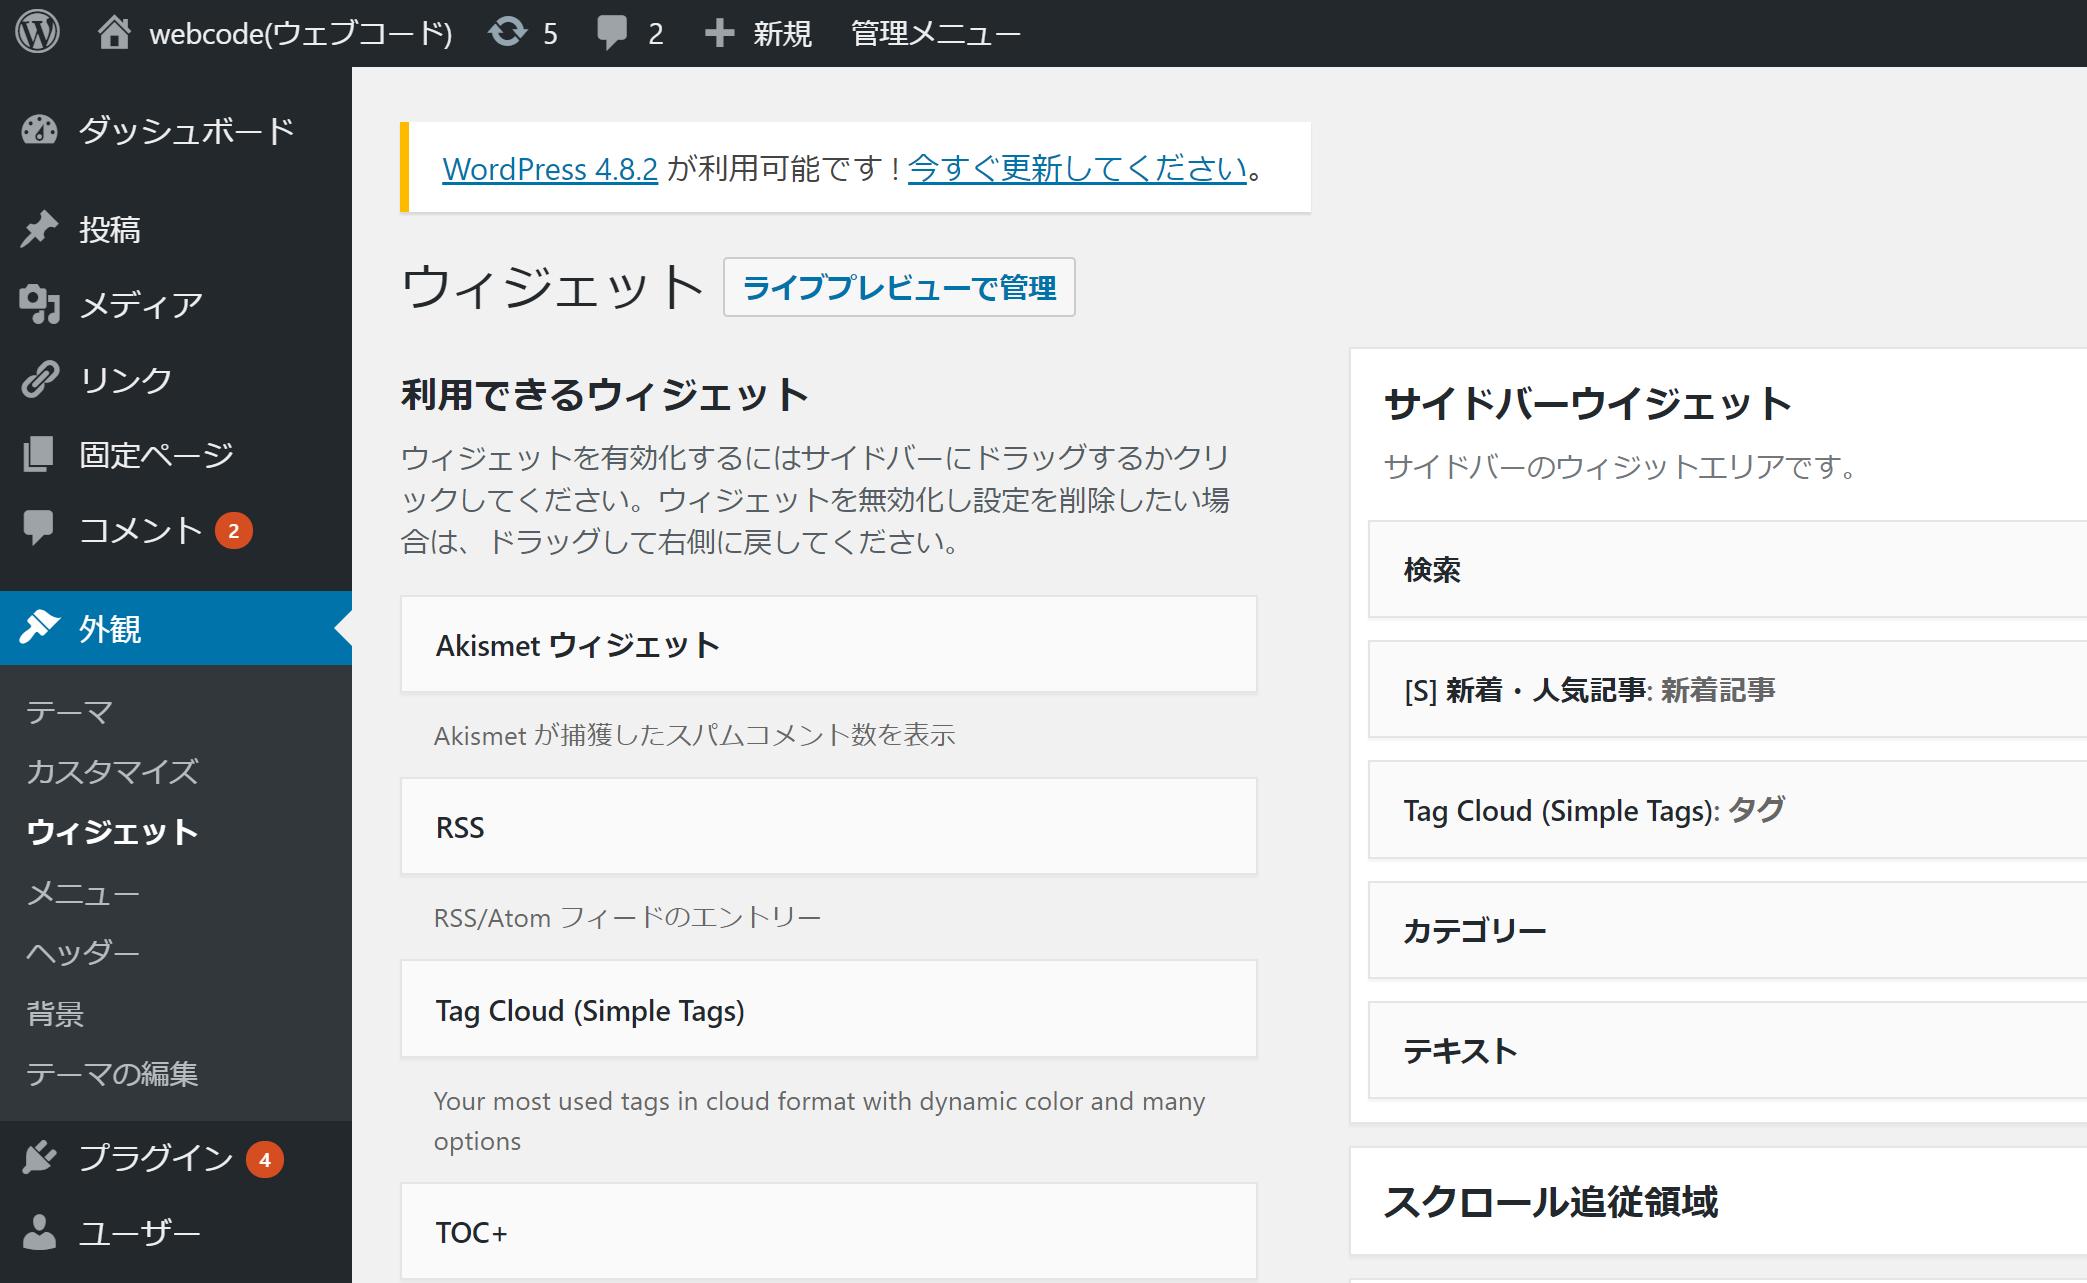 wpp wiget - WordPress Popular Postsの設定やカスタマイズの方法まとめ!人気記事をランキング形式で表示